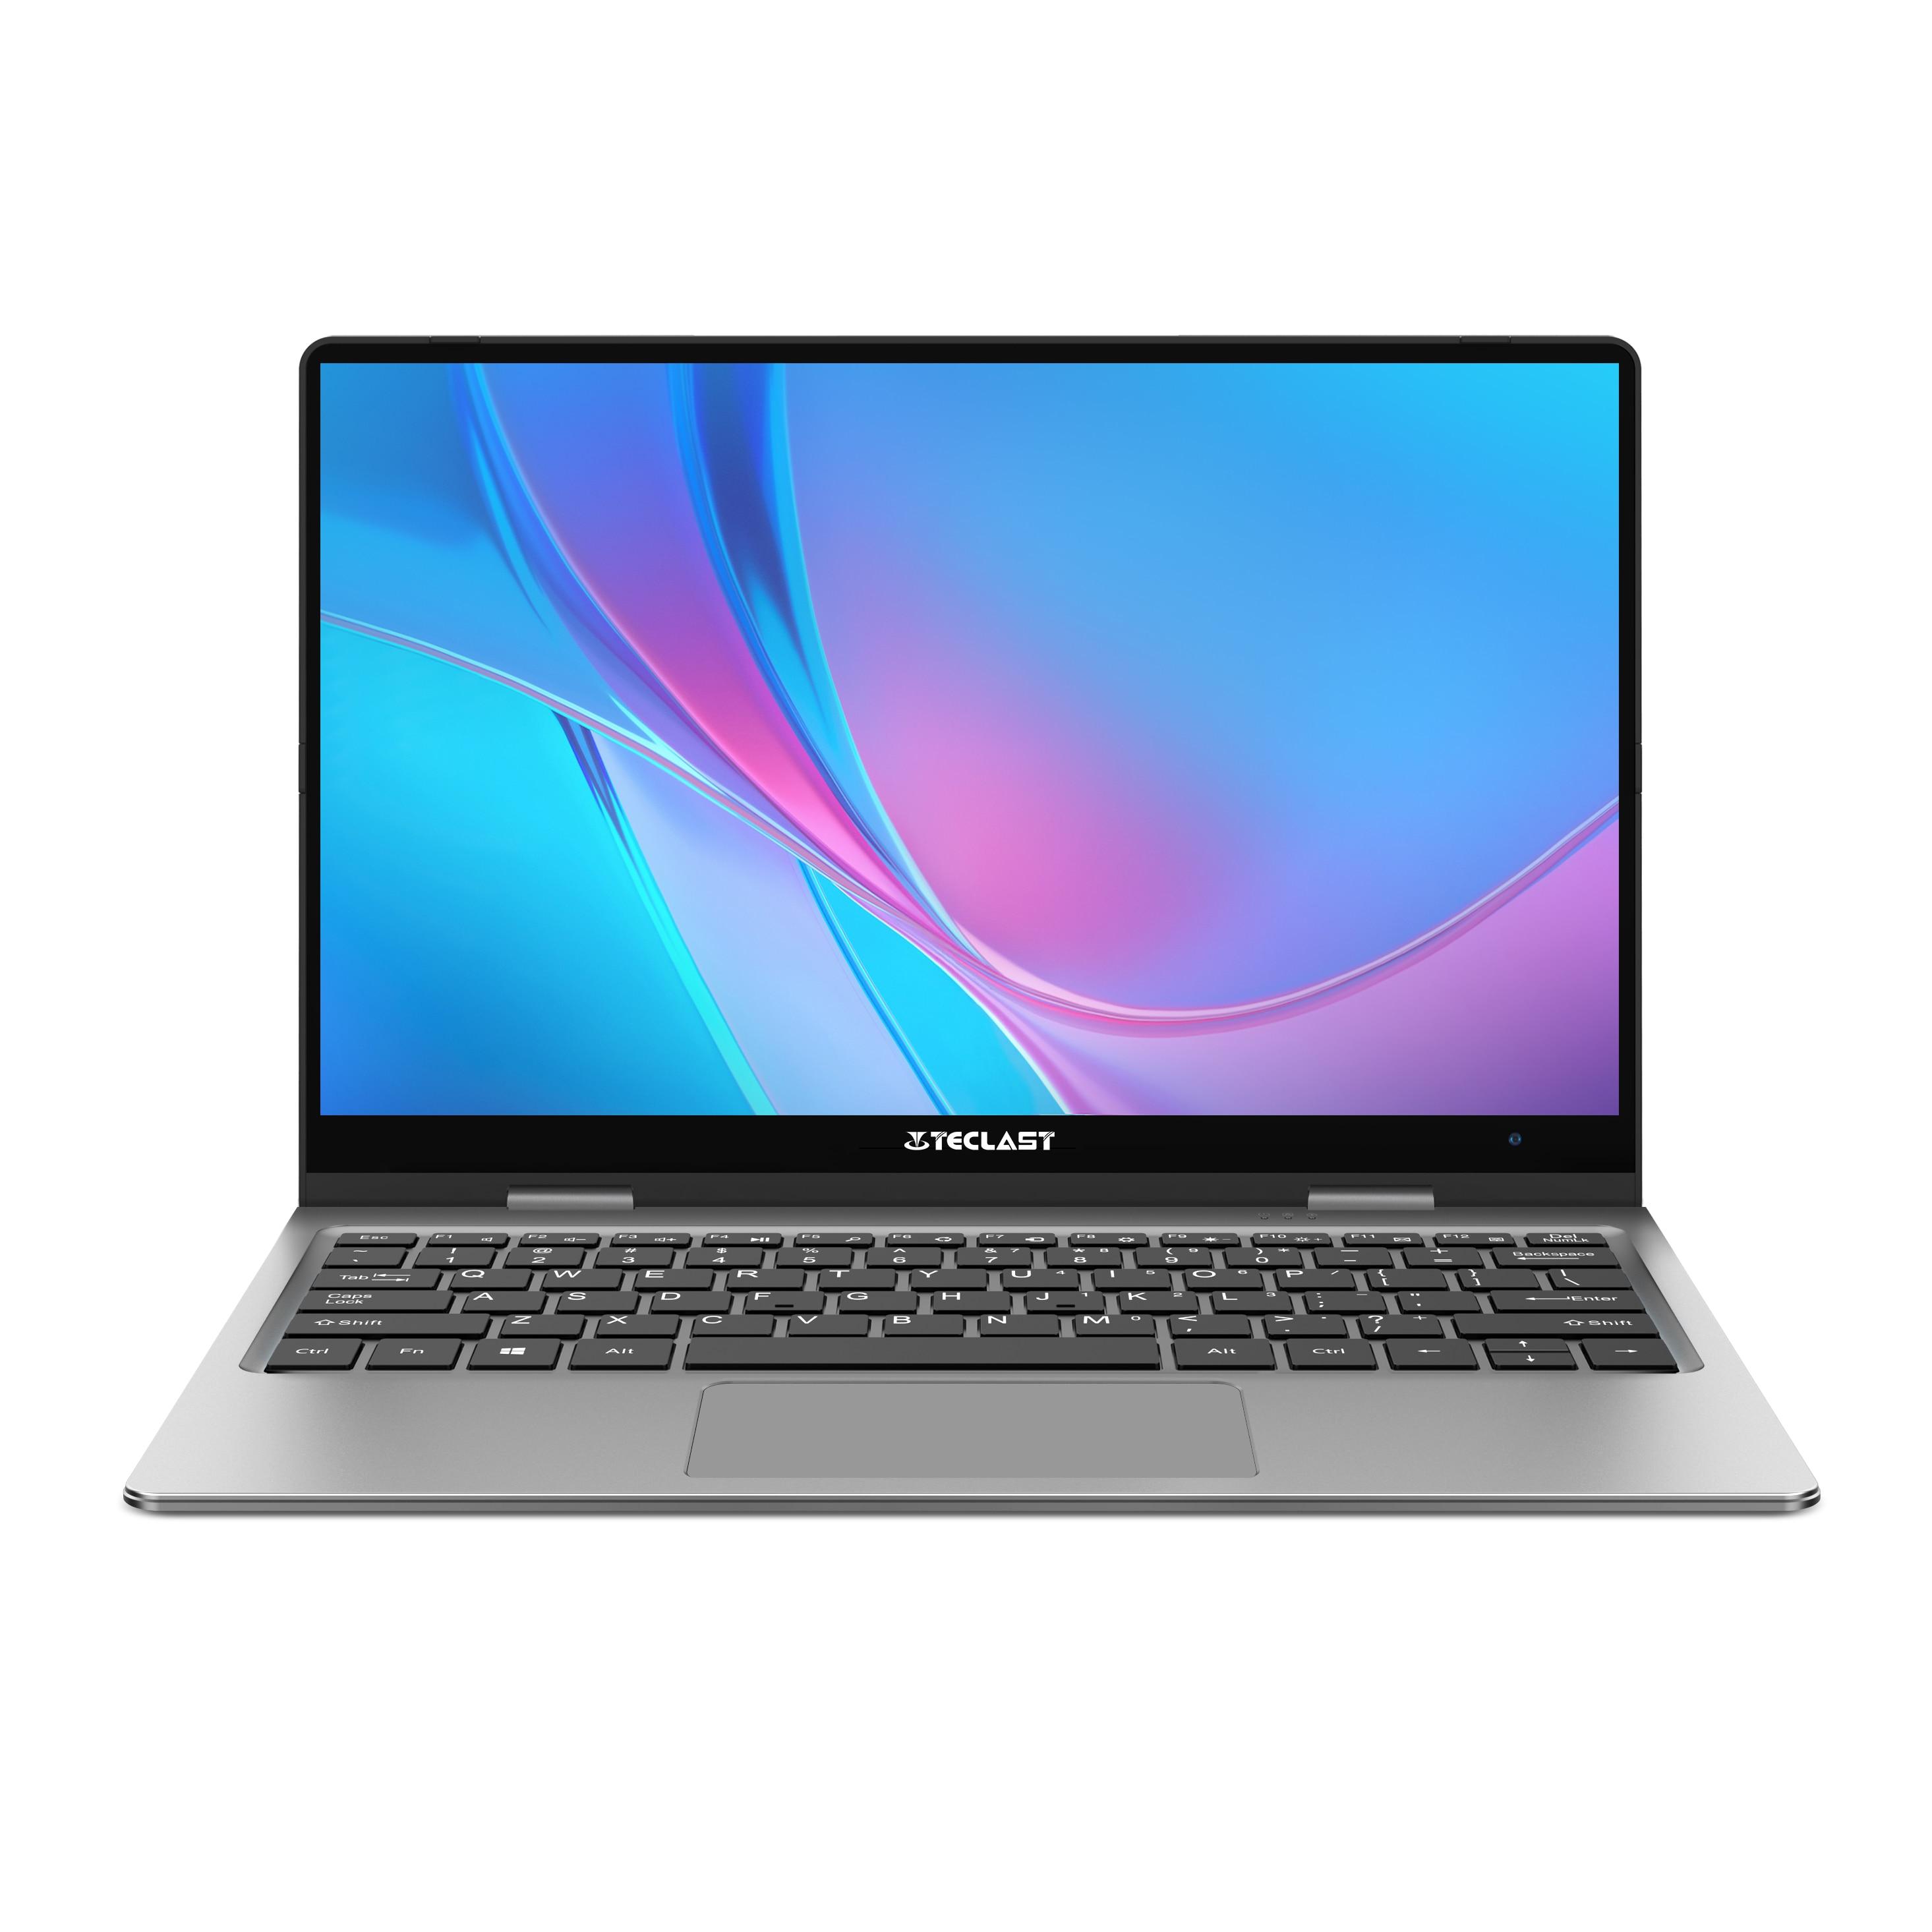 "Teclast F5 Laptop 8GB RAM 256GB SSD Windows10 Intel Gemini Lake N4100 Quad Core 360 Rotating Touch Screen 11.6"" Notebook PC|Laptops| |  -"